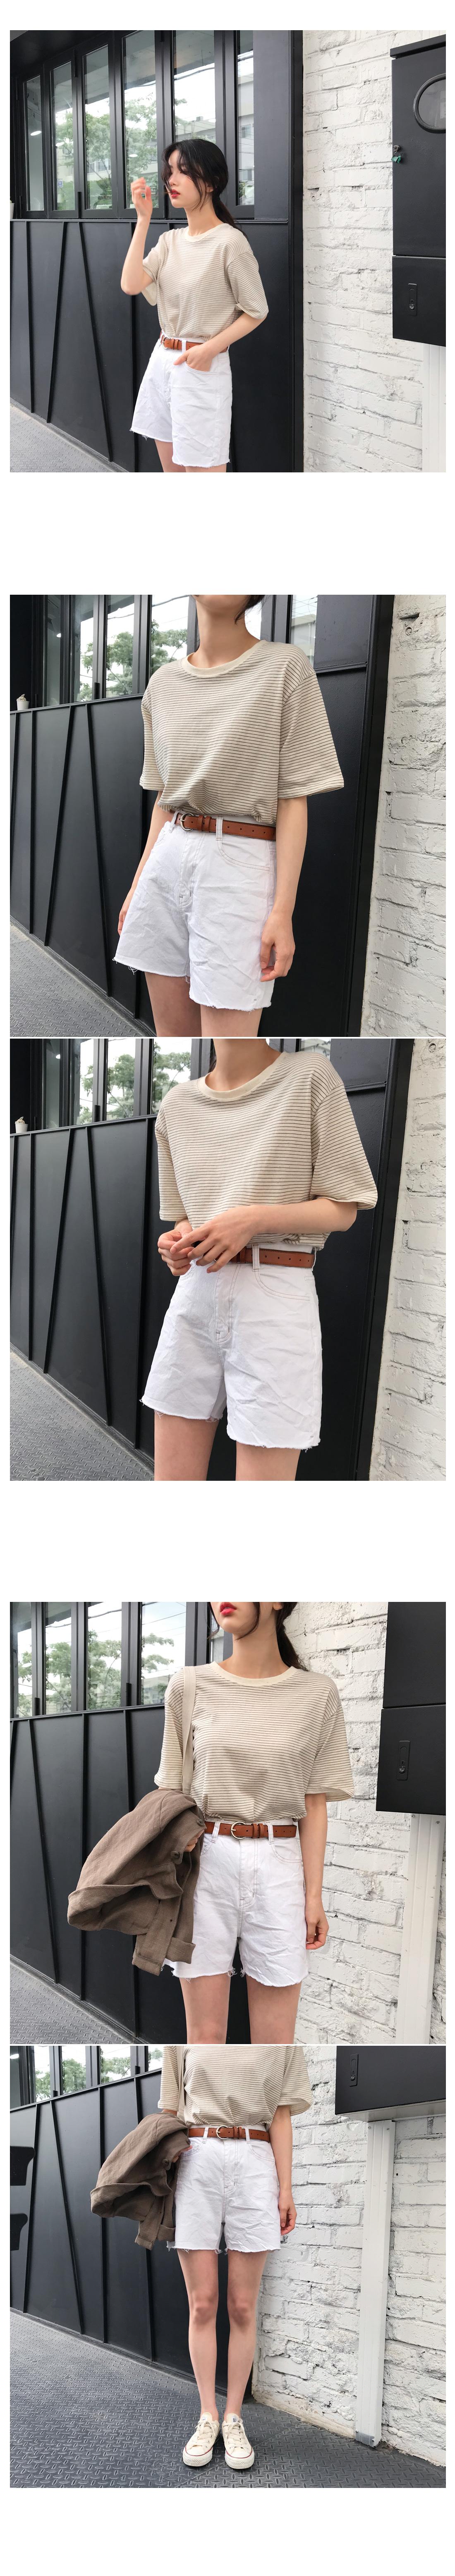 Vita Stripe short-sleeved polo shirt - Olive green ships same day